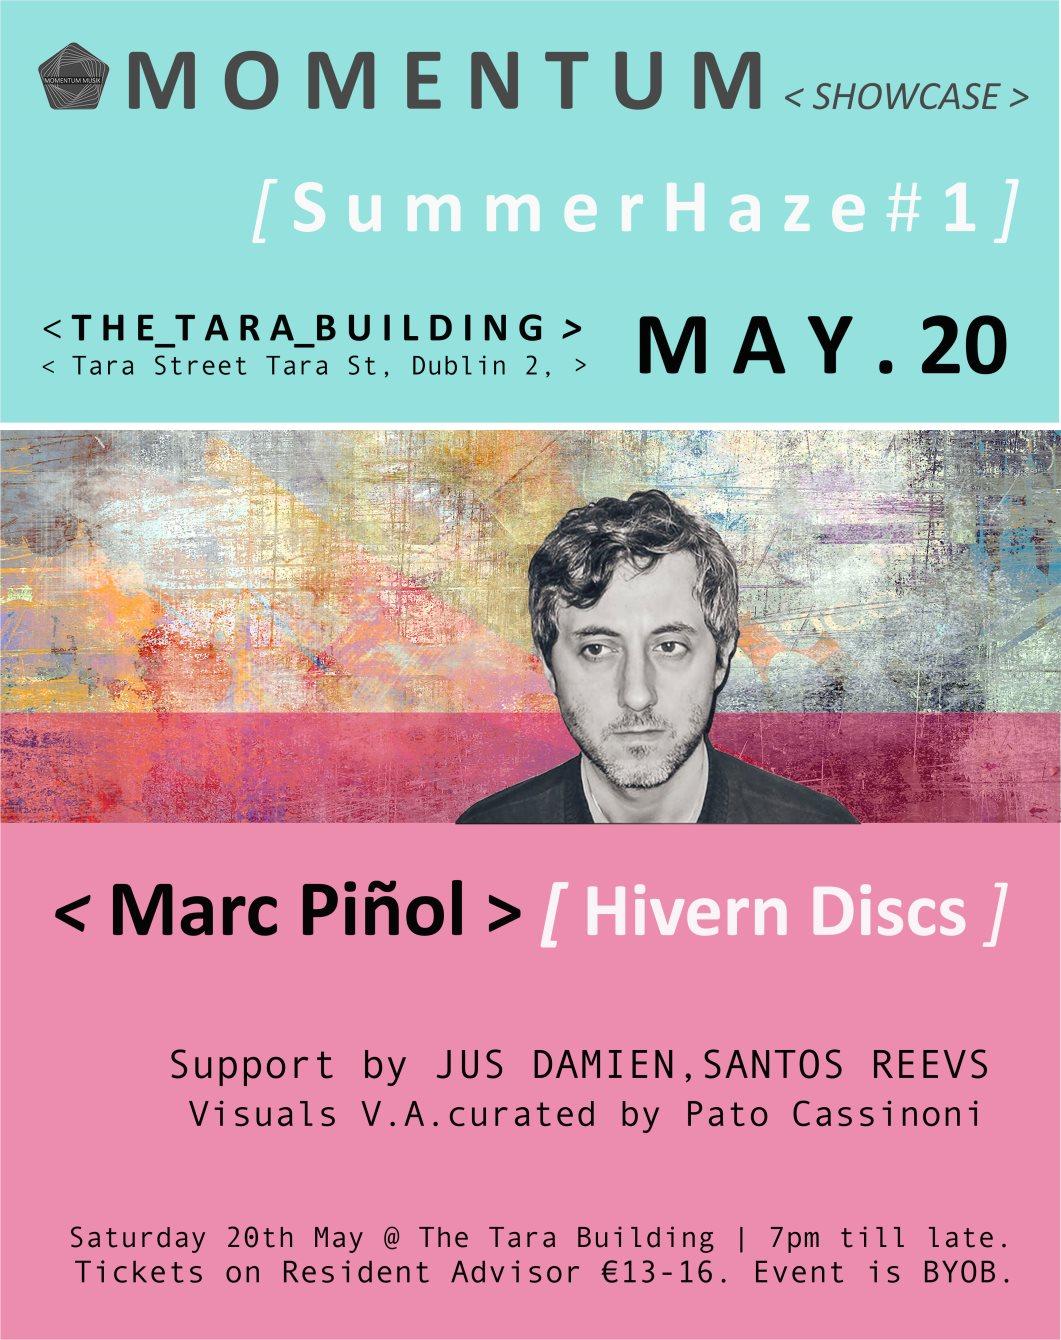 Marc Piñol Summer Haze #1 - Flyer front